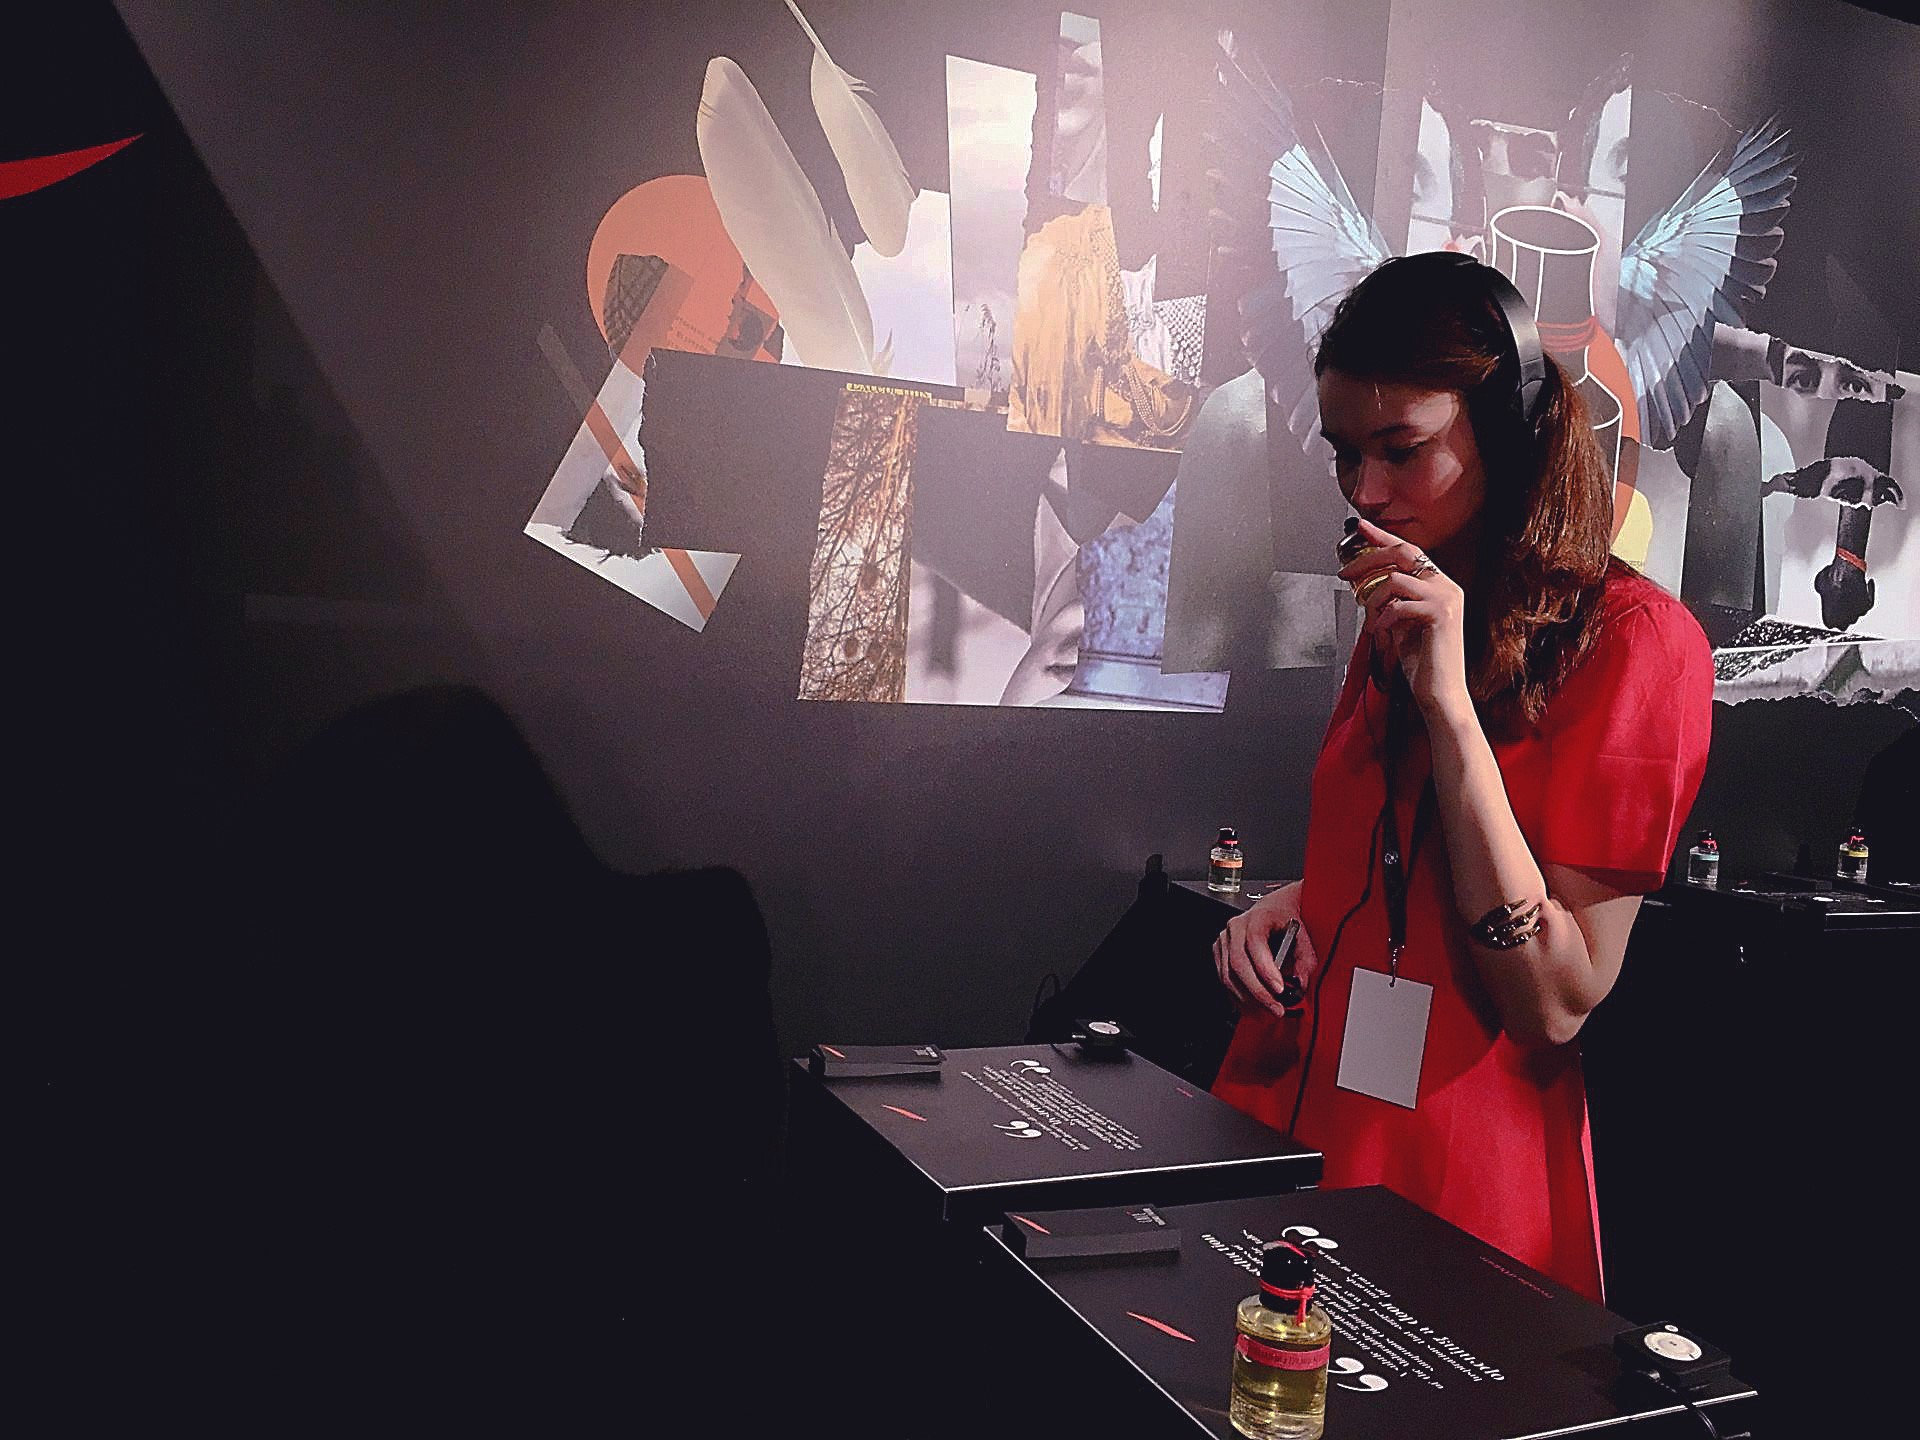 Mokamusic multi-sensorial project music and scent